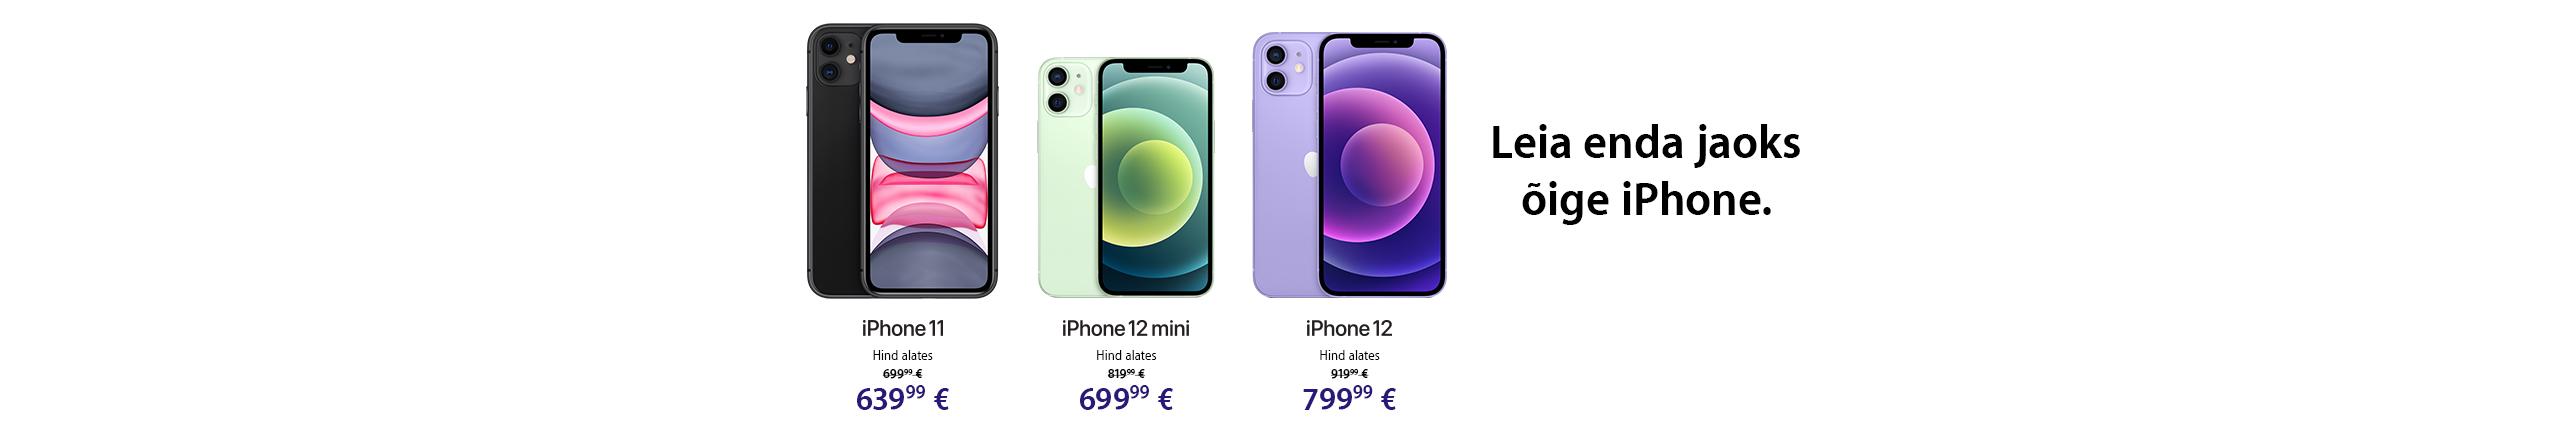 FPS Apple iPhone 11, iPhone 12 ja iPhone 12 mini special offers